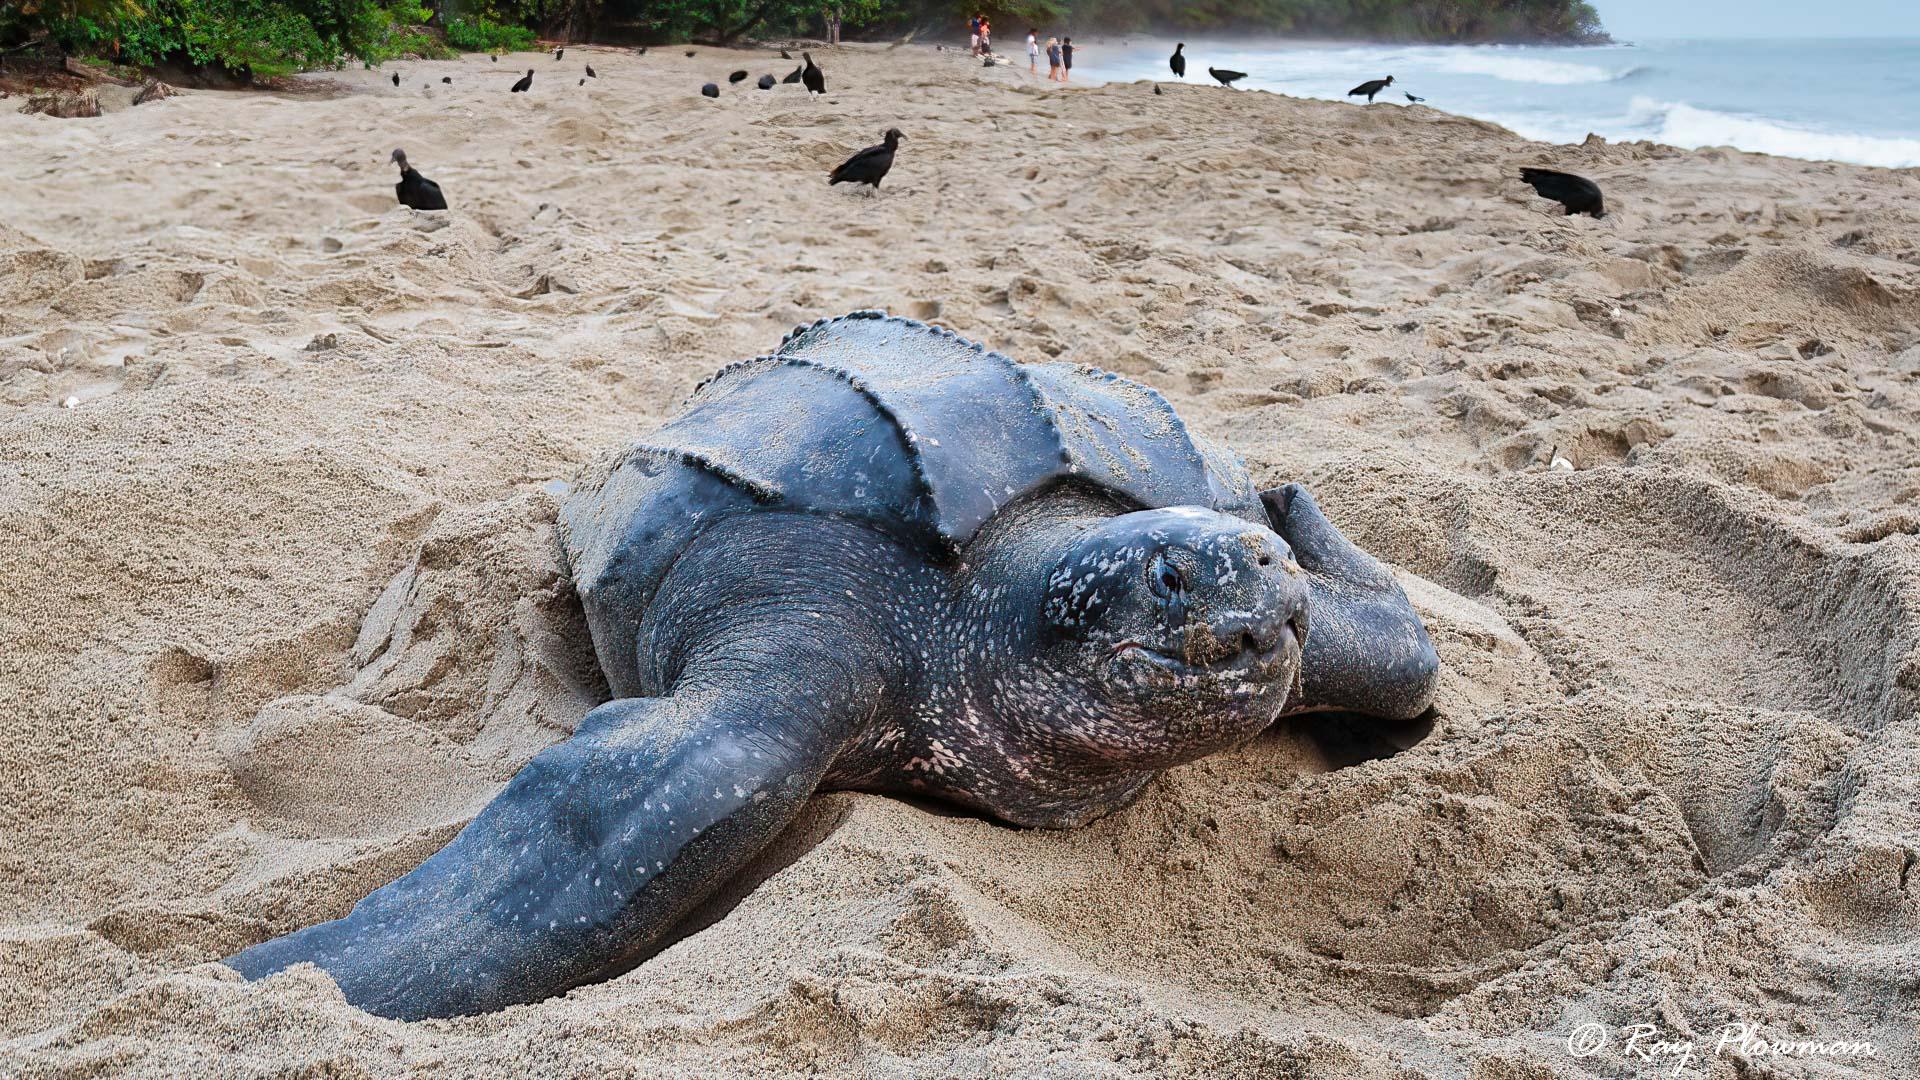 Leatherback Turtle (Dermochelys coriacea) on the beach at Grande Riviere in Trinidad